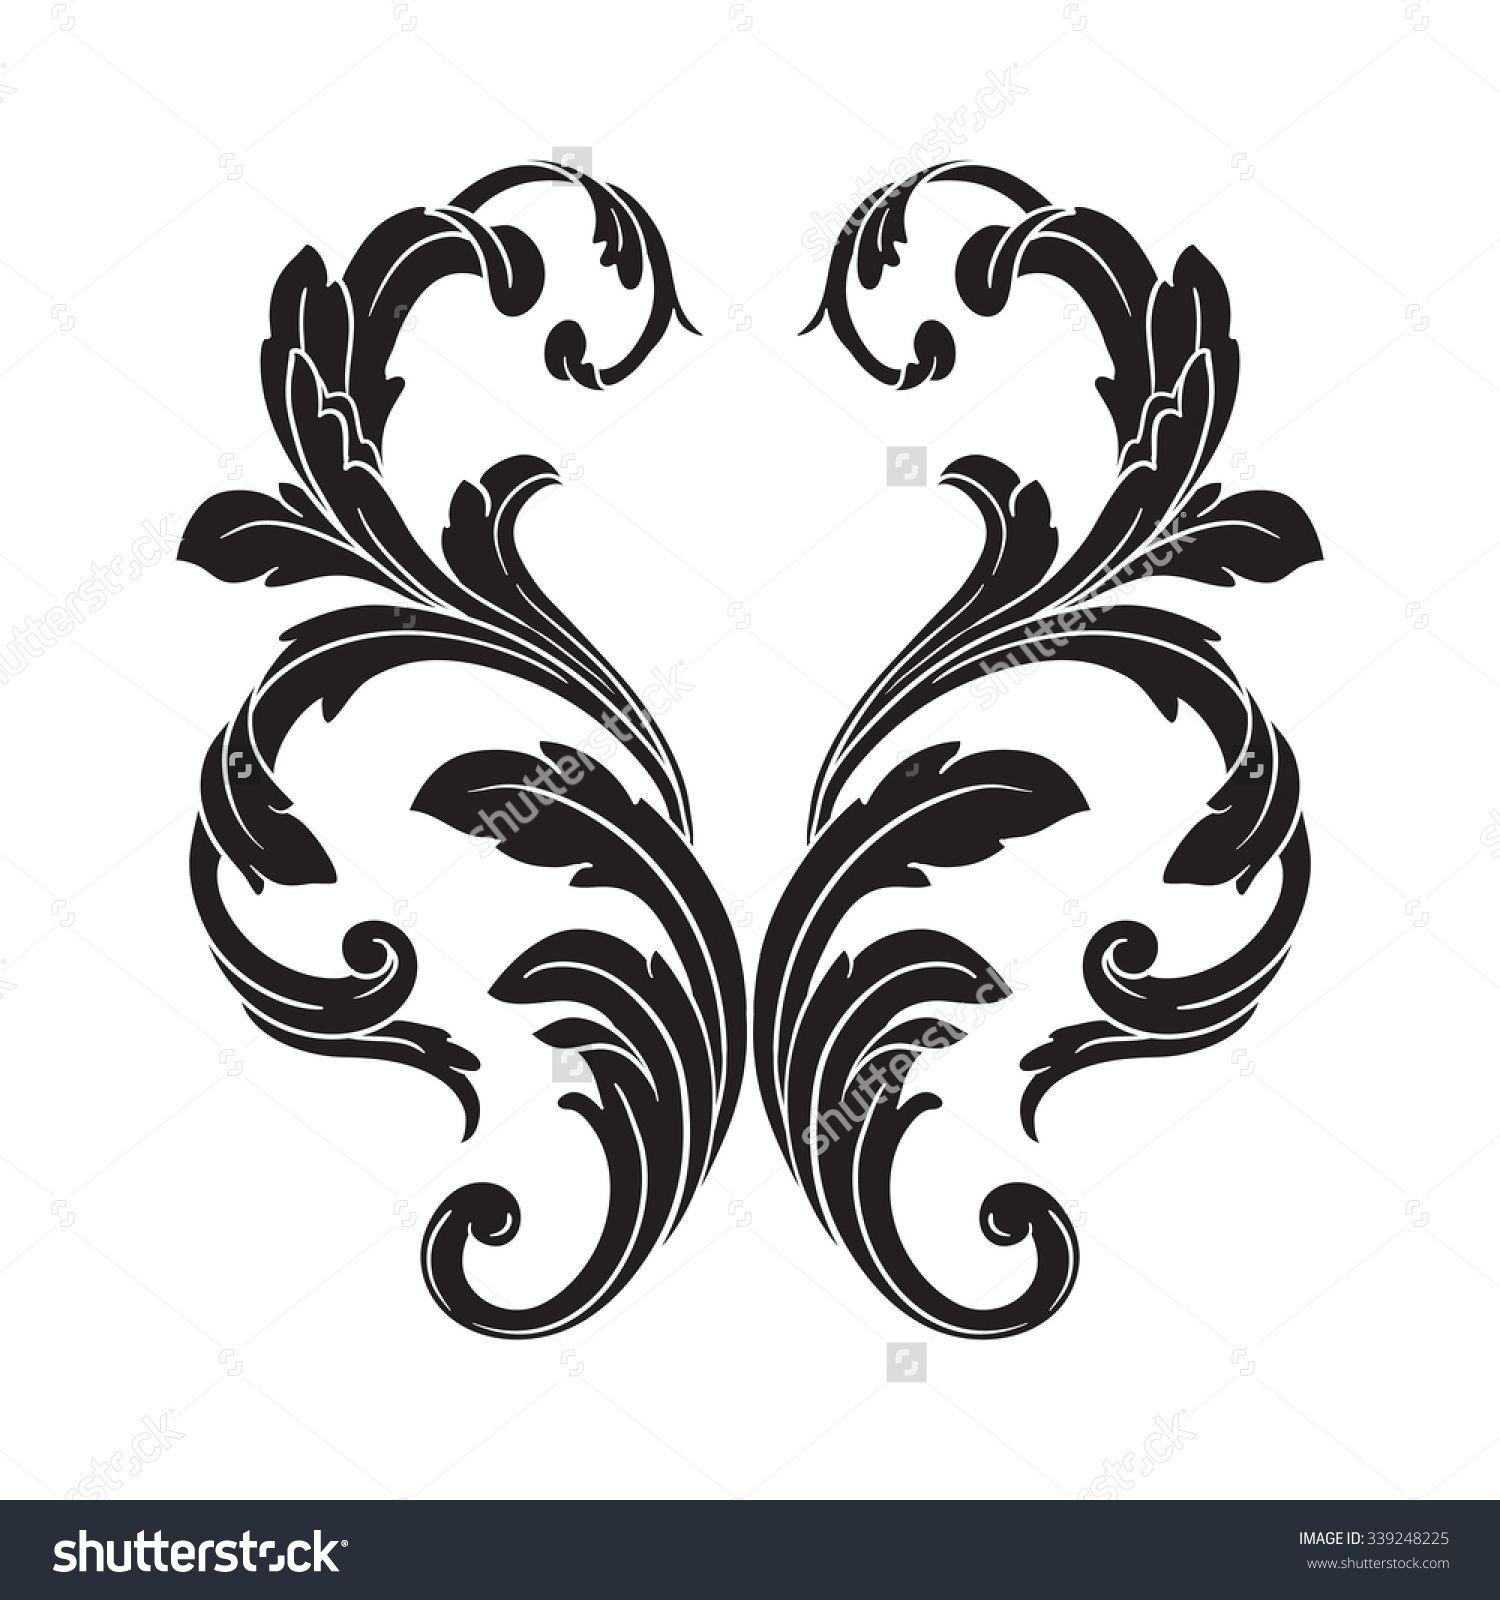 http image shutterstock com z stock vector vintage baroque frame rh pinterest com filigree vector free filigree vector image